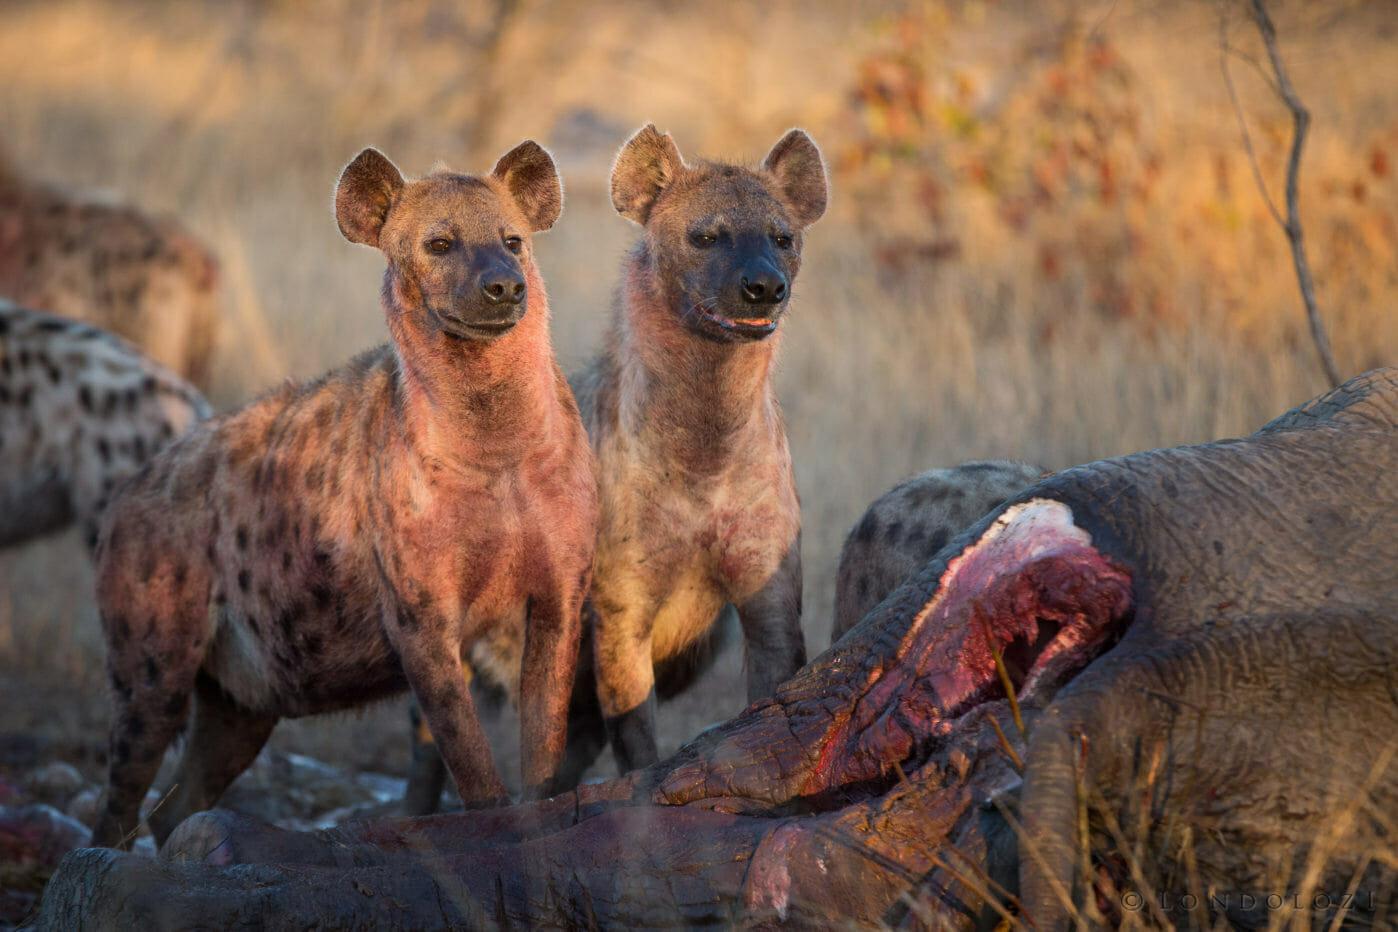 Vulture Hyena Elephant Carcass 2